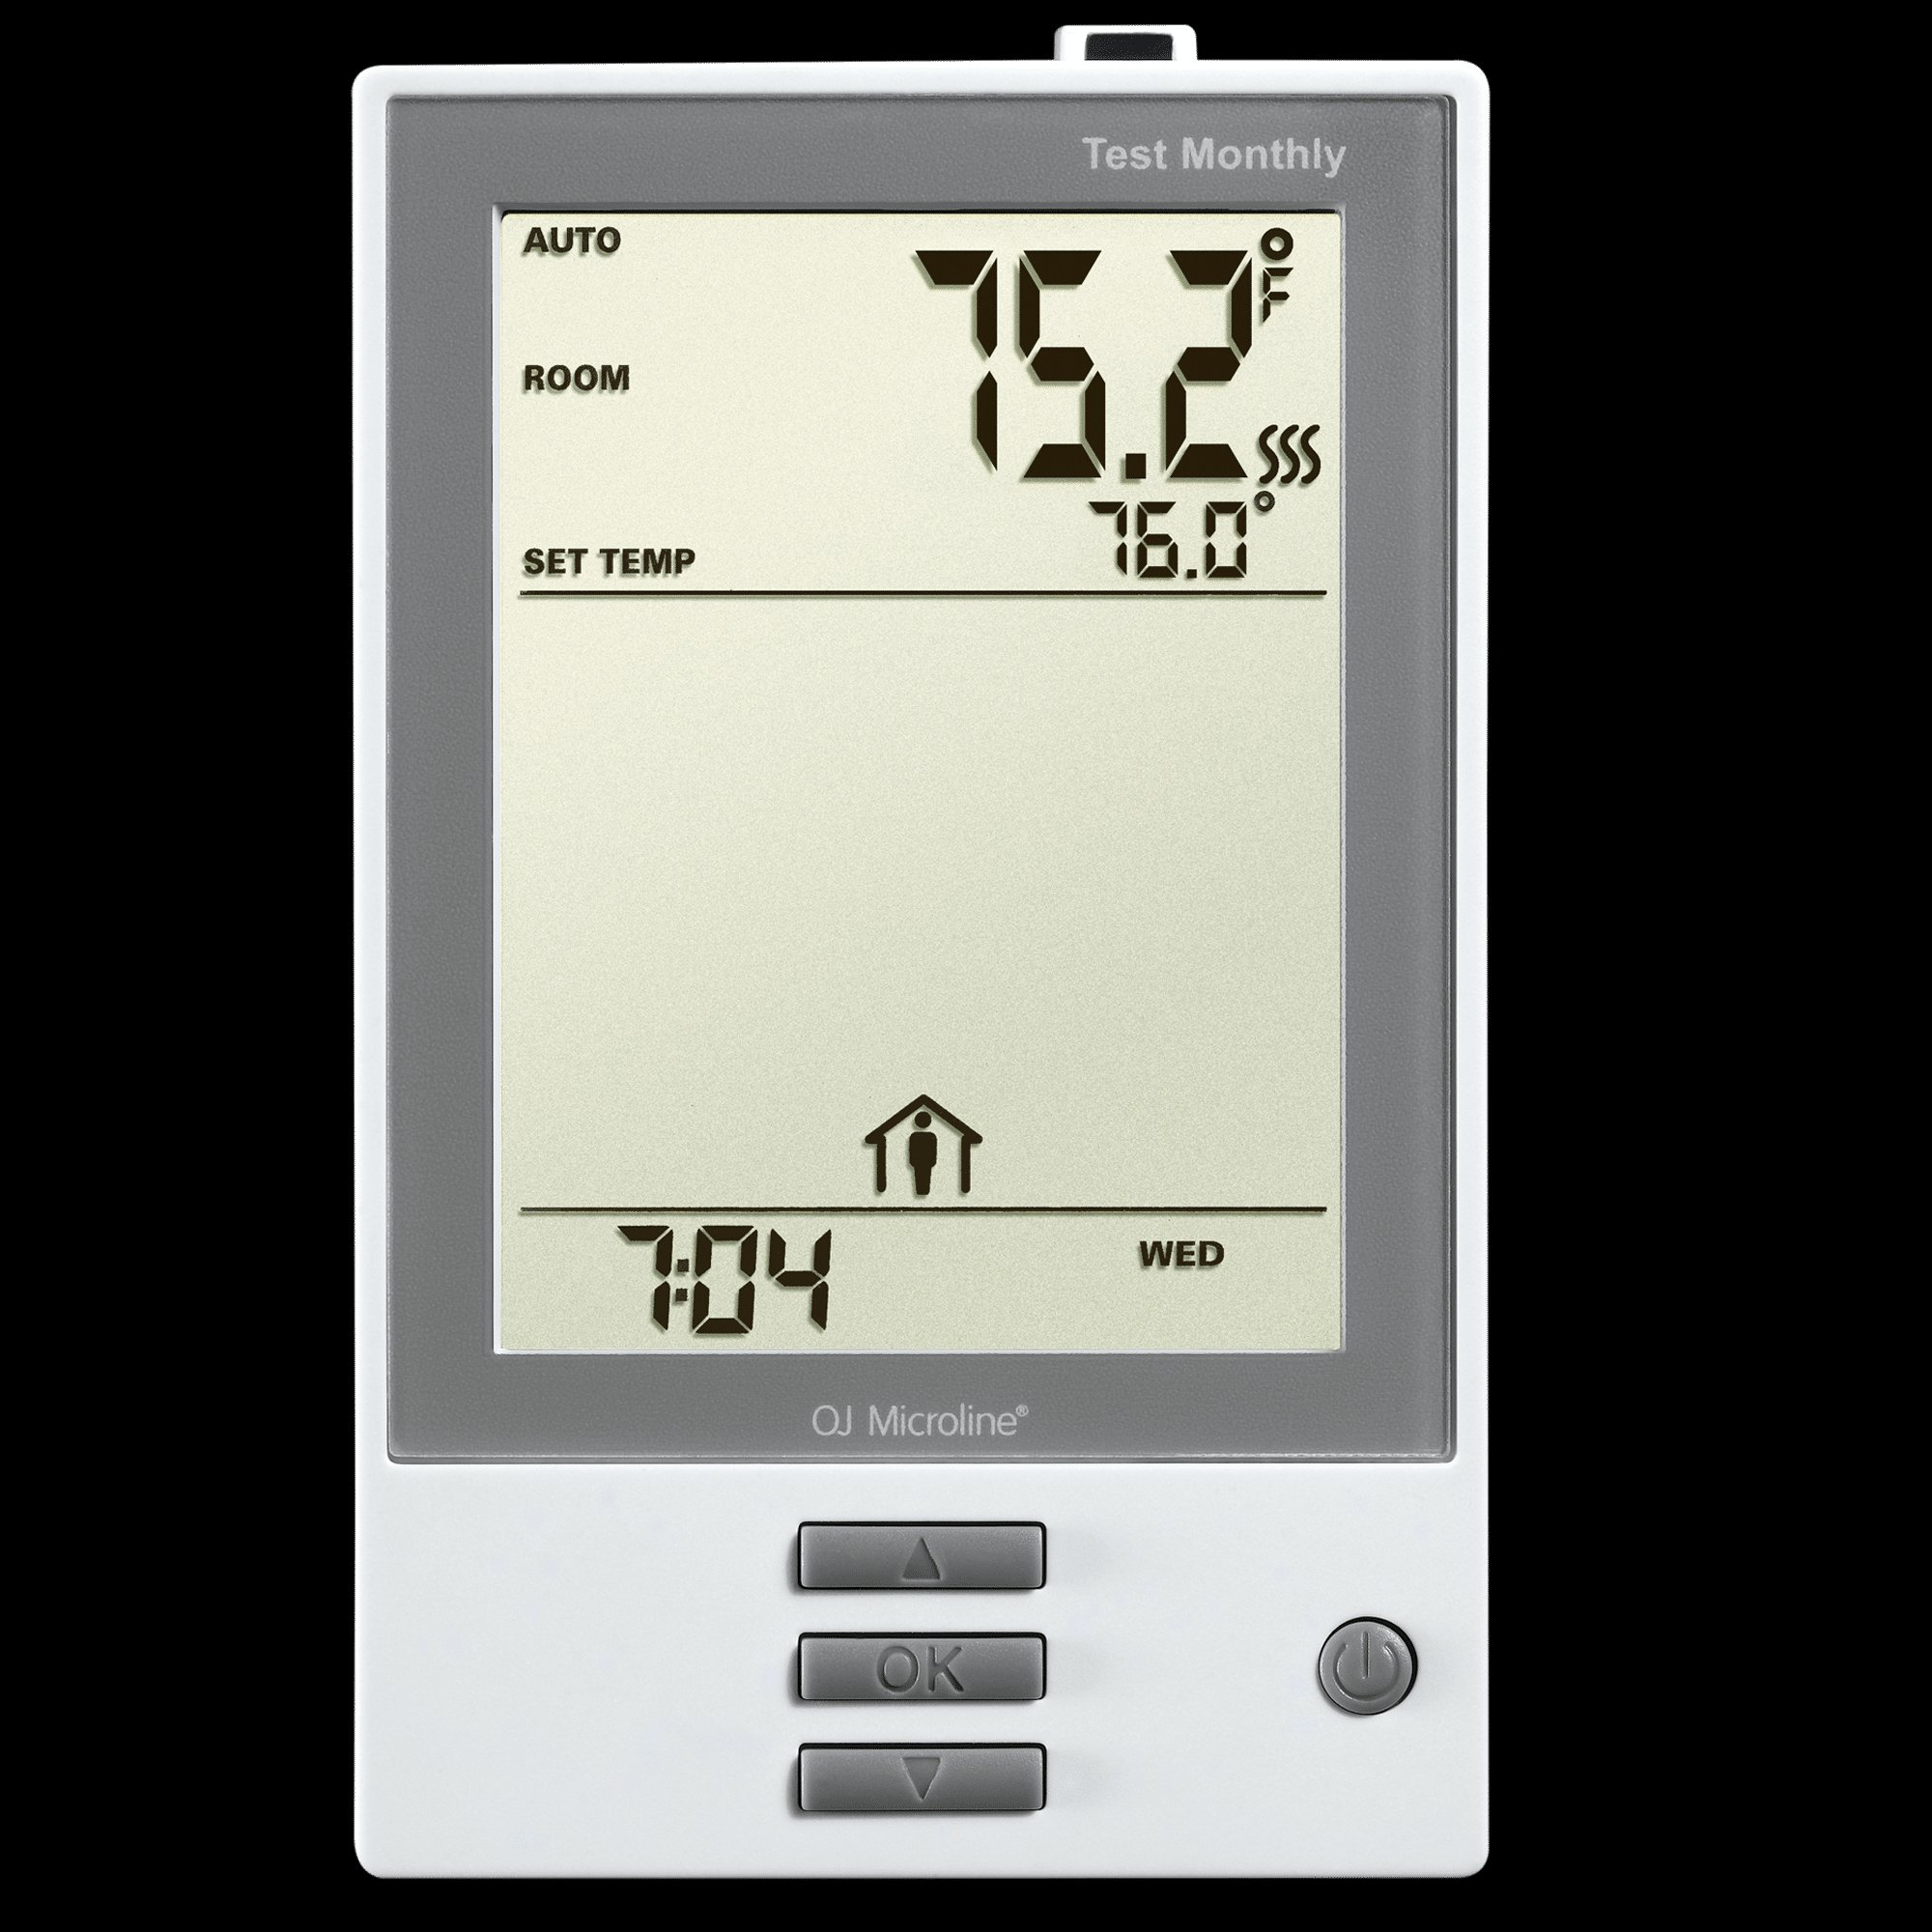 hight resolution of nhance udg 4999 nhance floor heating thermostat regulator mode labeled diagram